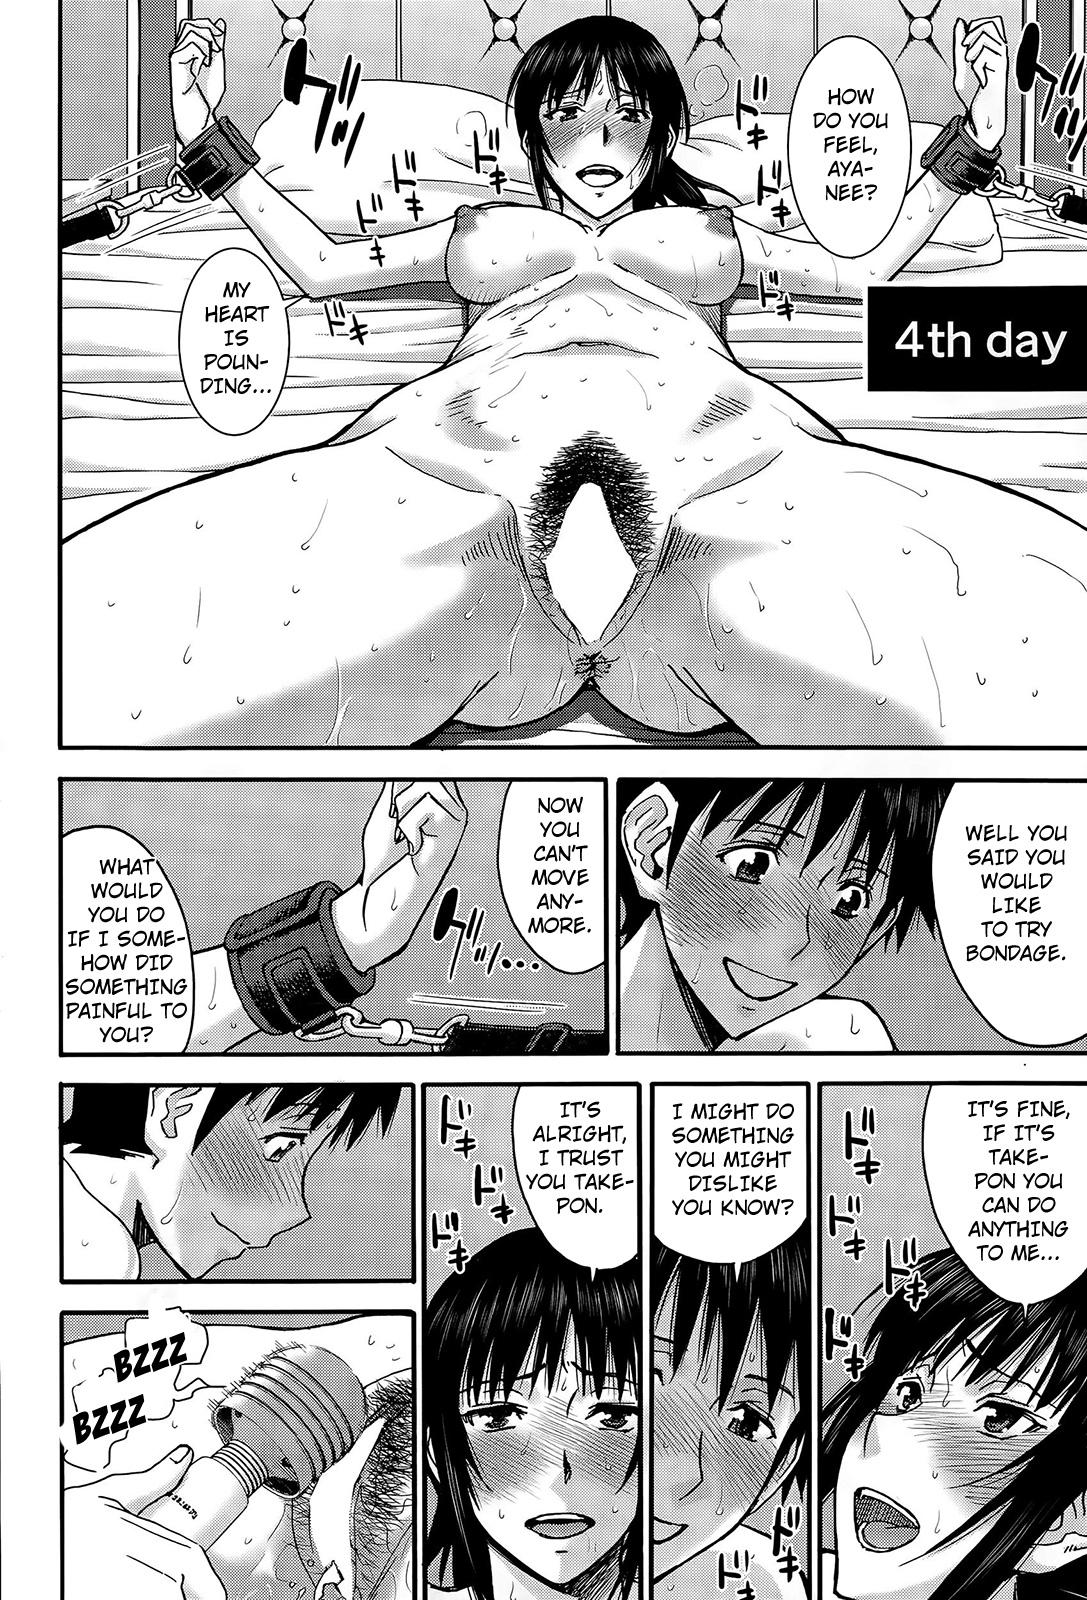 Boku to Itoko no 7-kakan Sex | Seven Days of Sex with Cousin 9